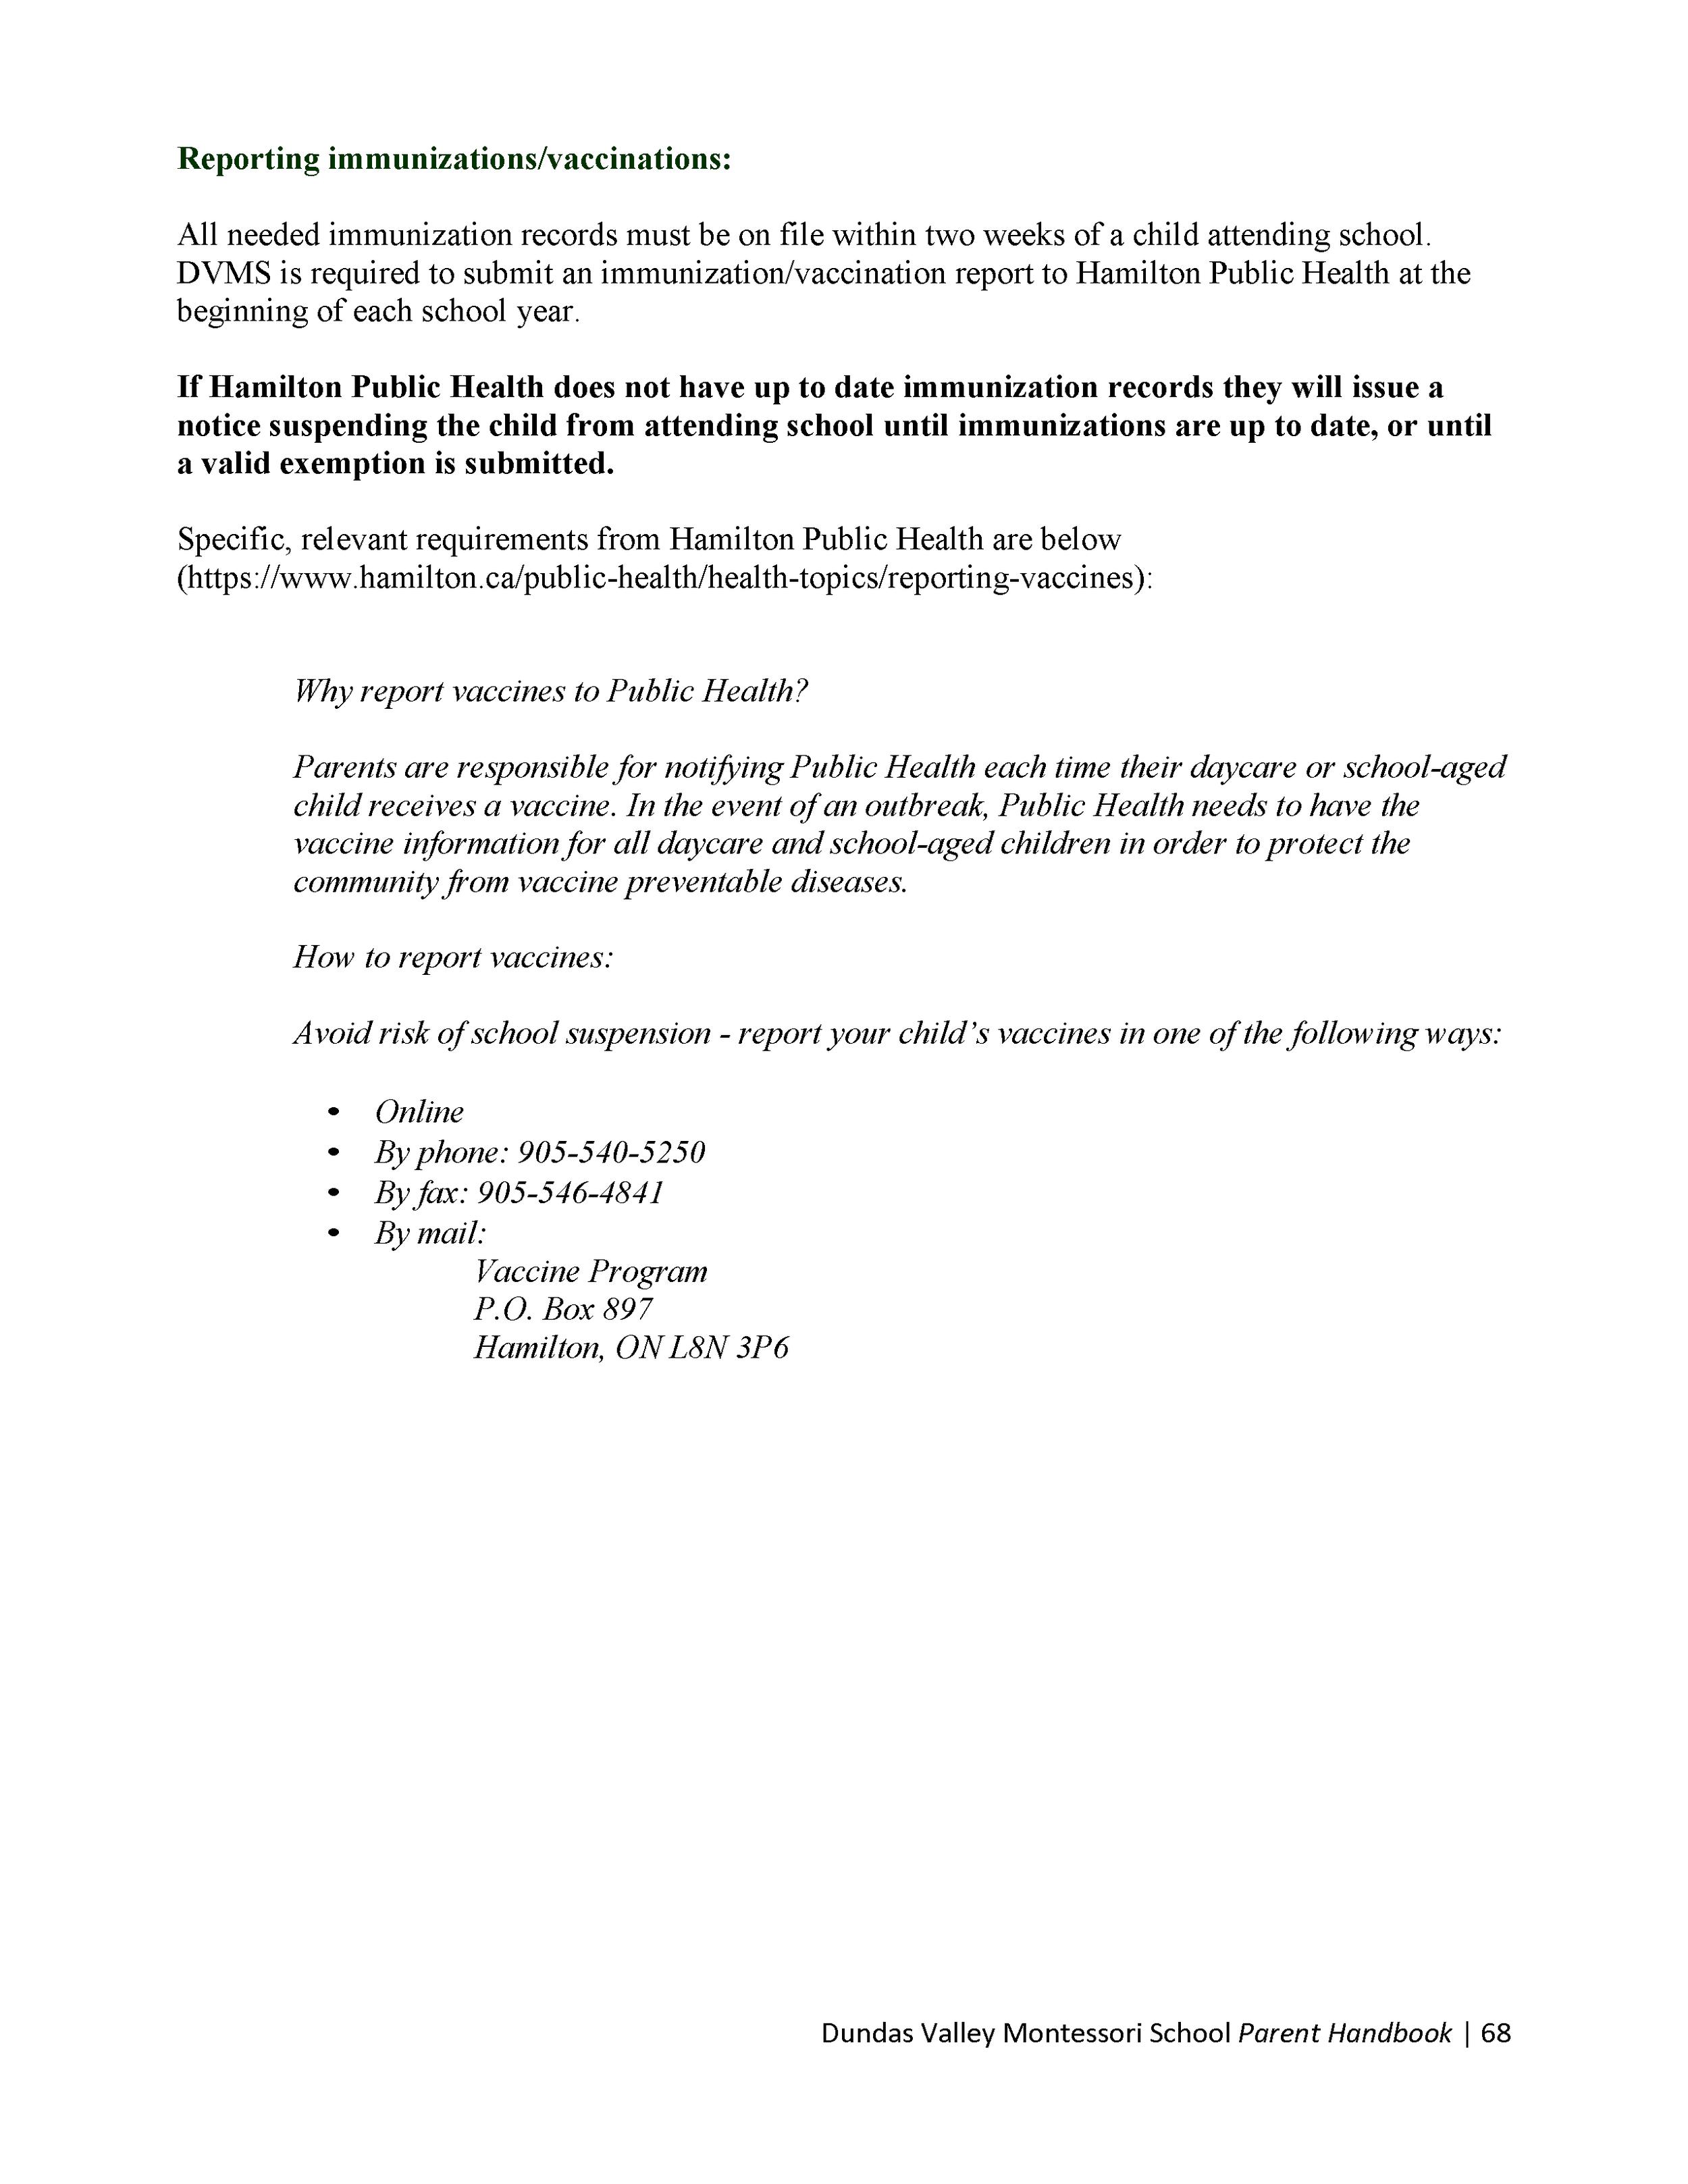 DVMS-Parent-Handbook-19-20_Page_070.png